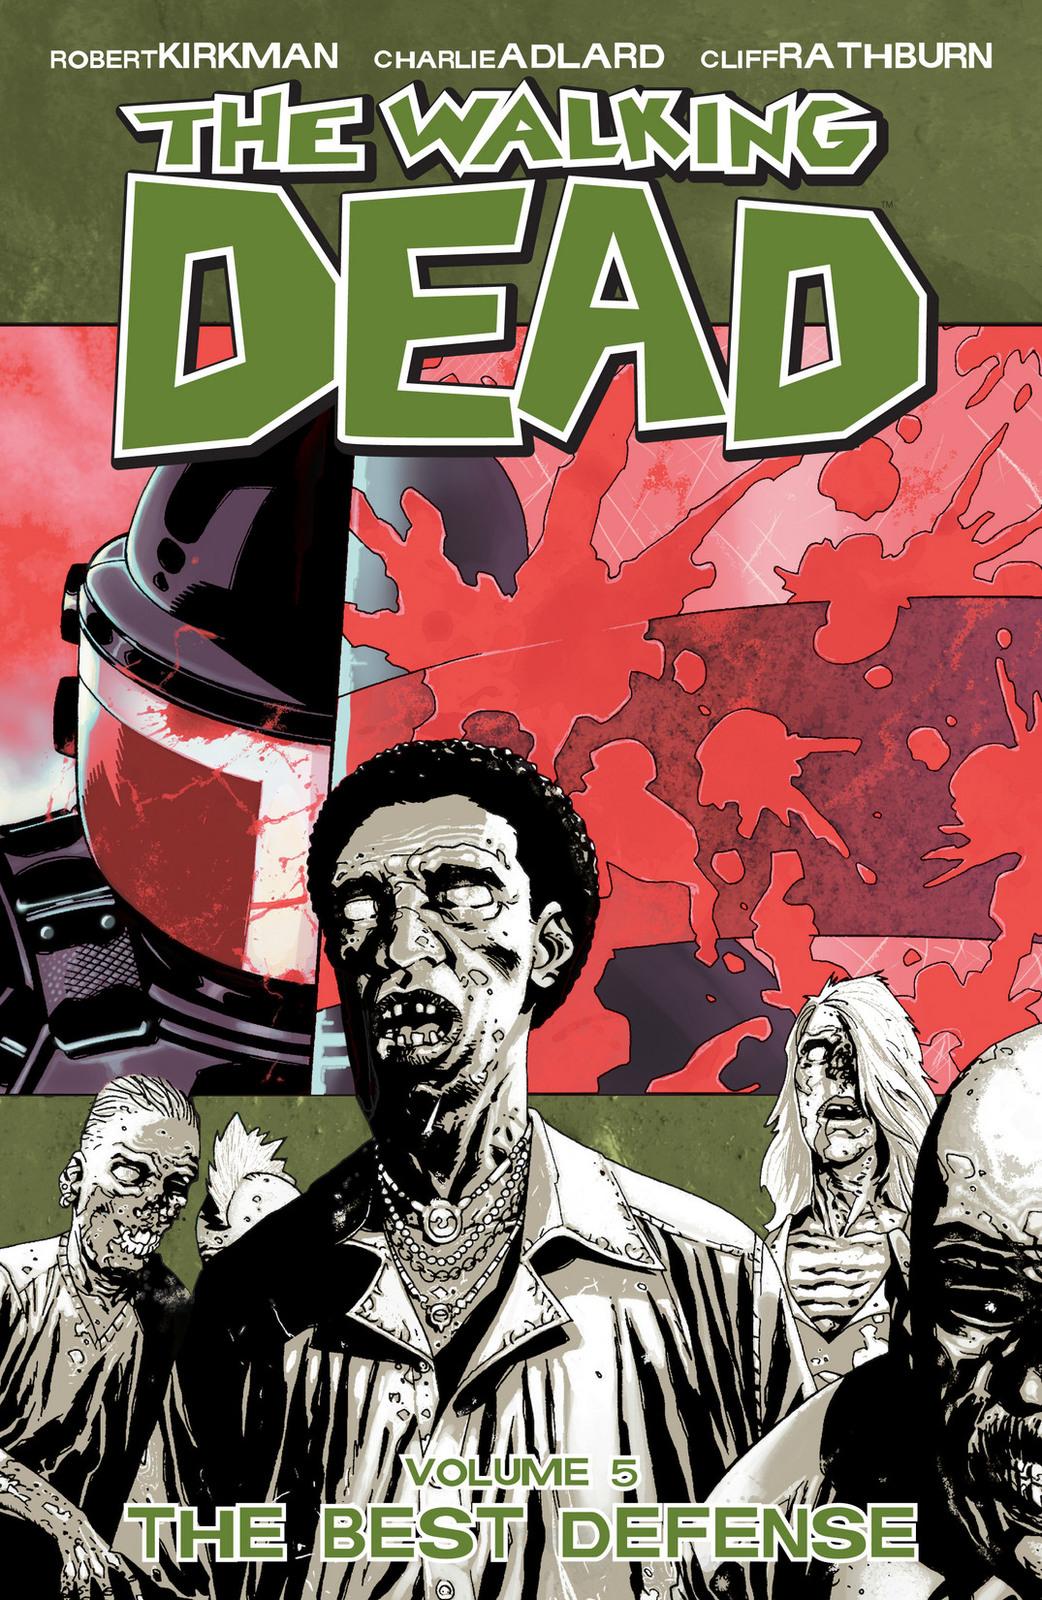 The Walking Dead Volume 5: The Best Defense by Robert Kirkman image